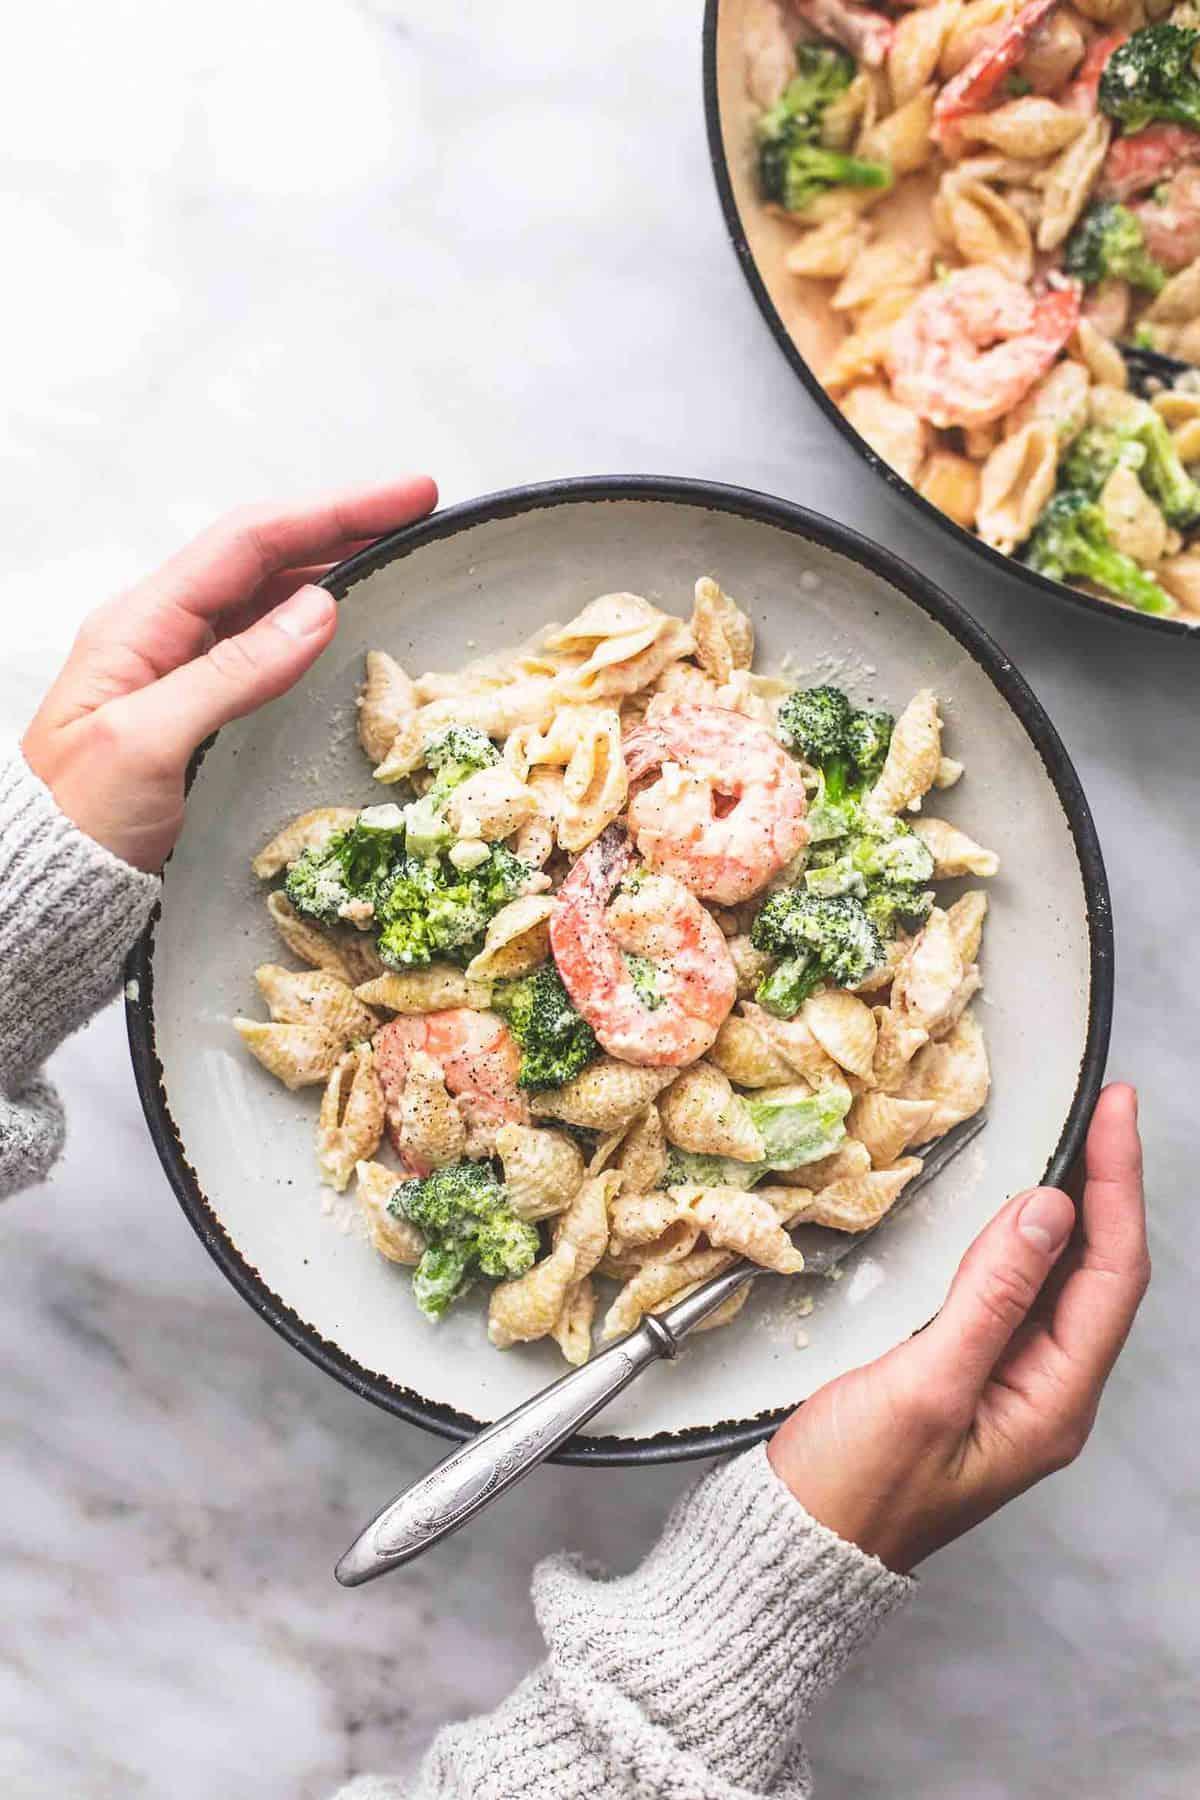 Shrimp and Broccoli Alfredo easy dinner recipe | lecremedelacrumb.com